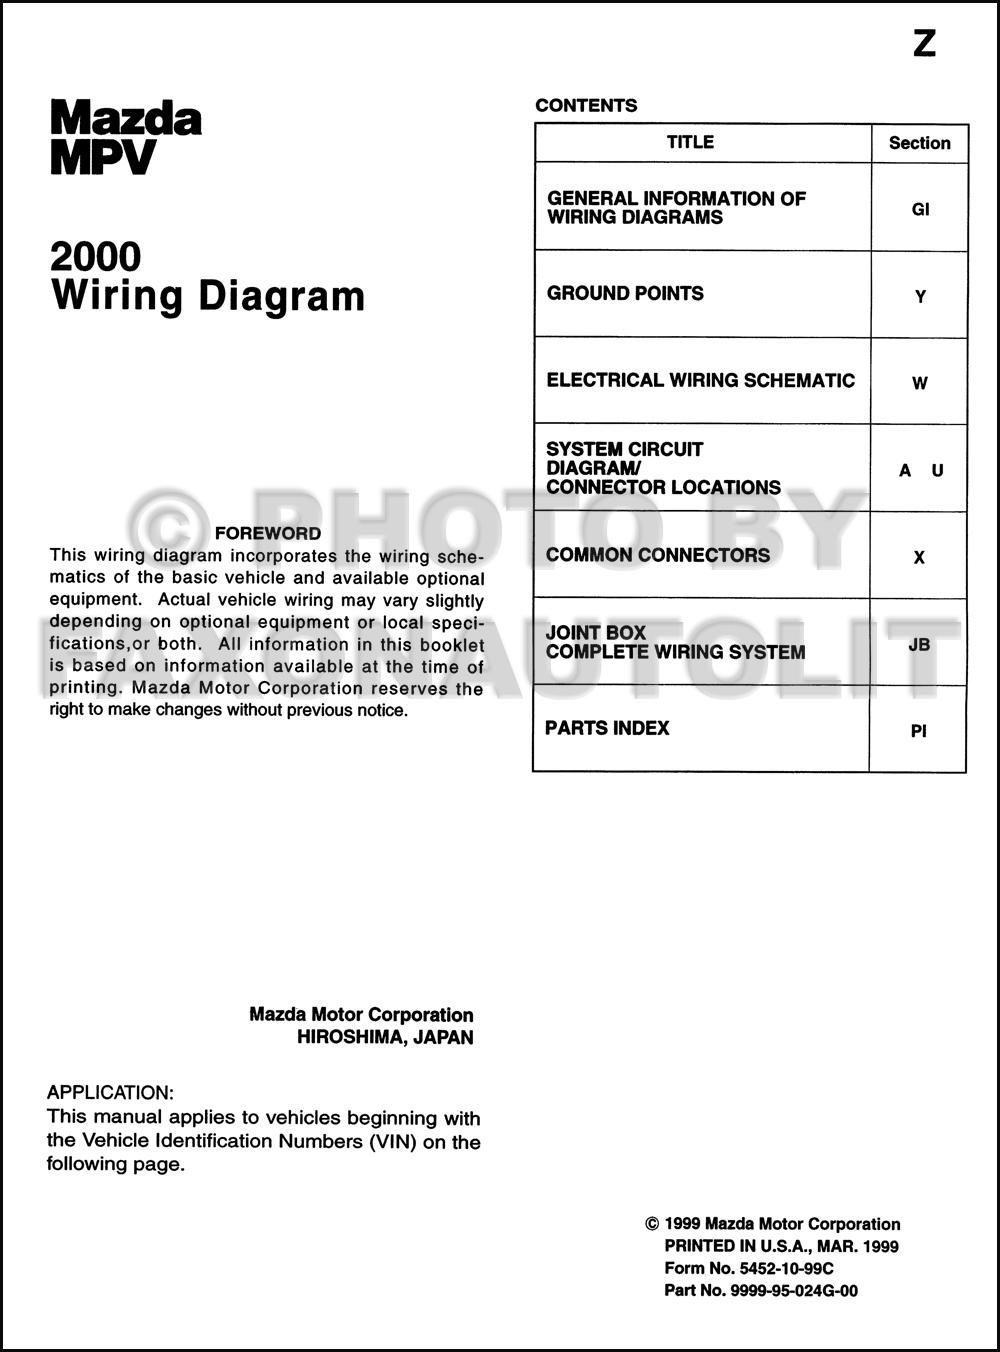 2000 mazda mpv wiring diagram manual original click on thumbnail to zoom cheapraybanclubmaster Image collections